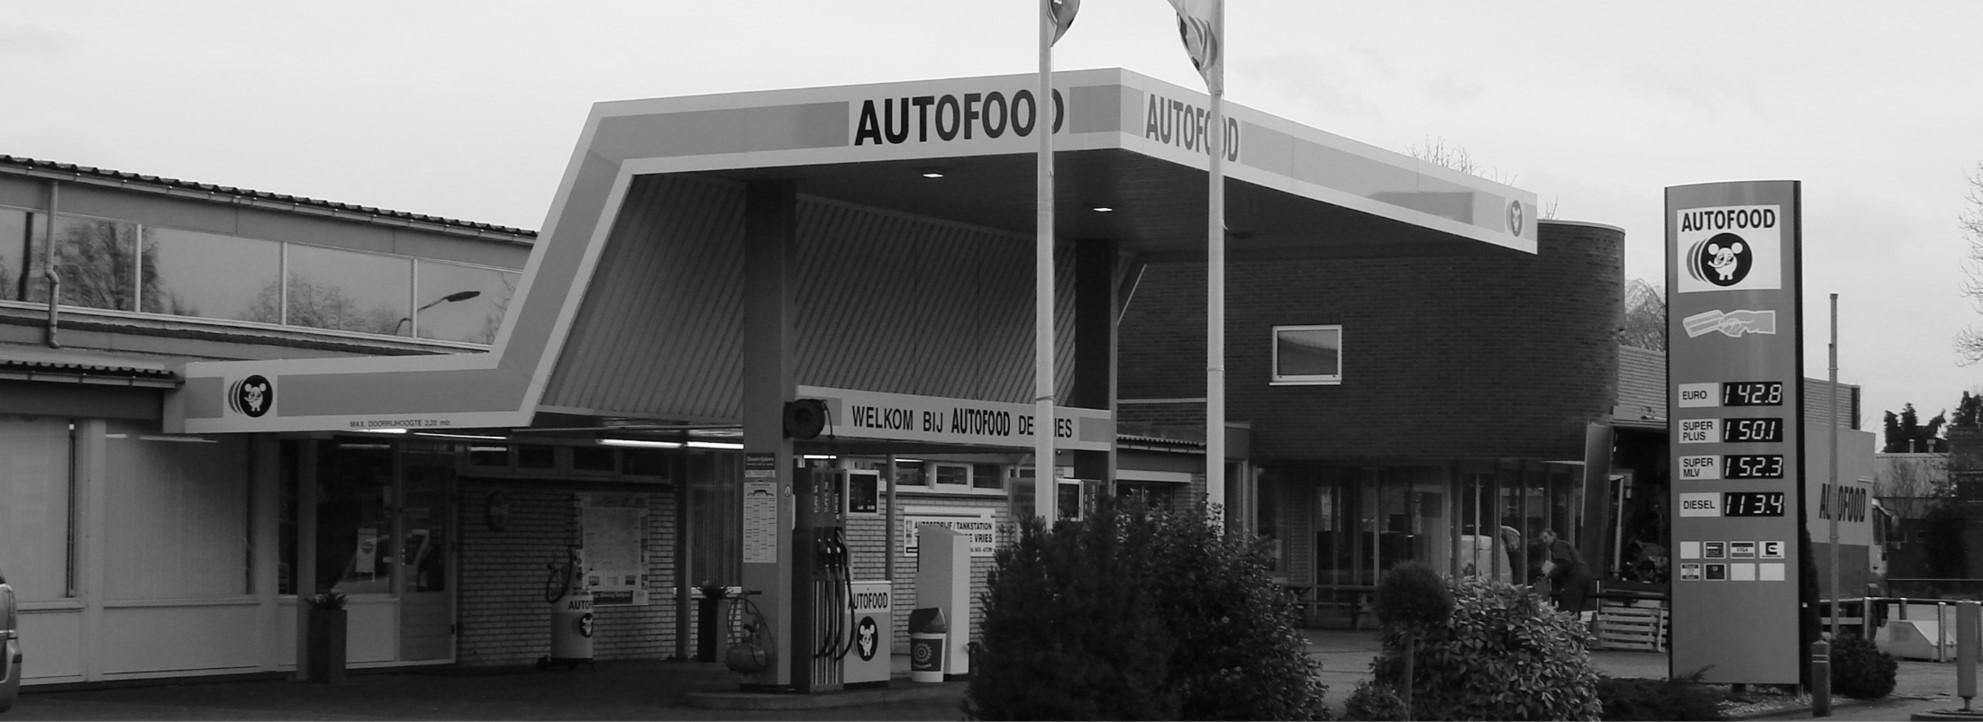 Autofood tankstations